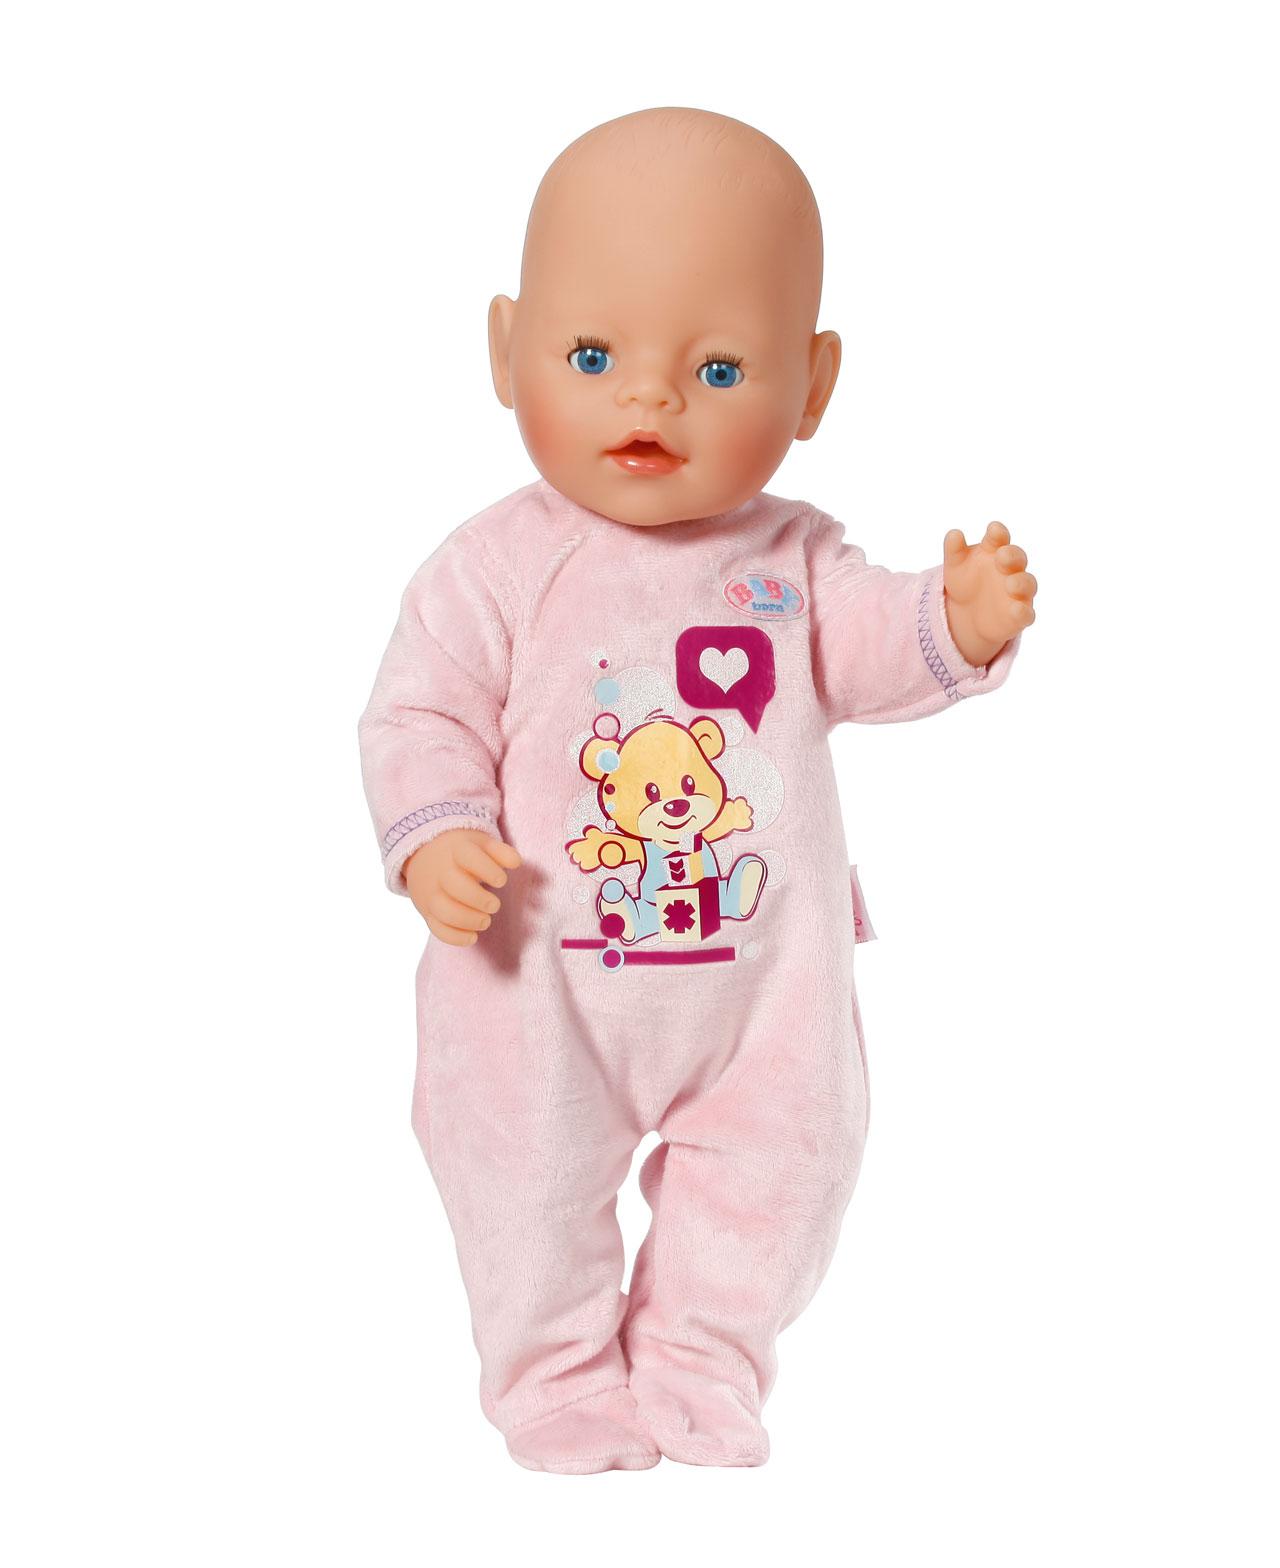 Baby Born Romper Collection | Baby Born | Prima Toys